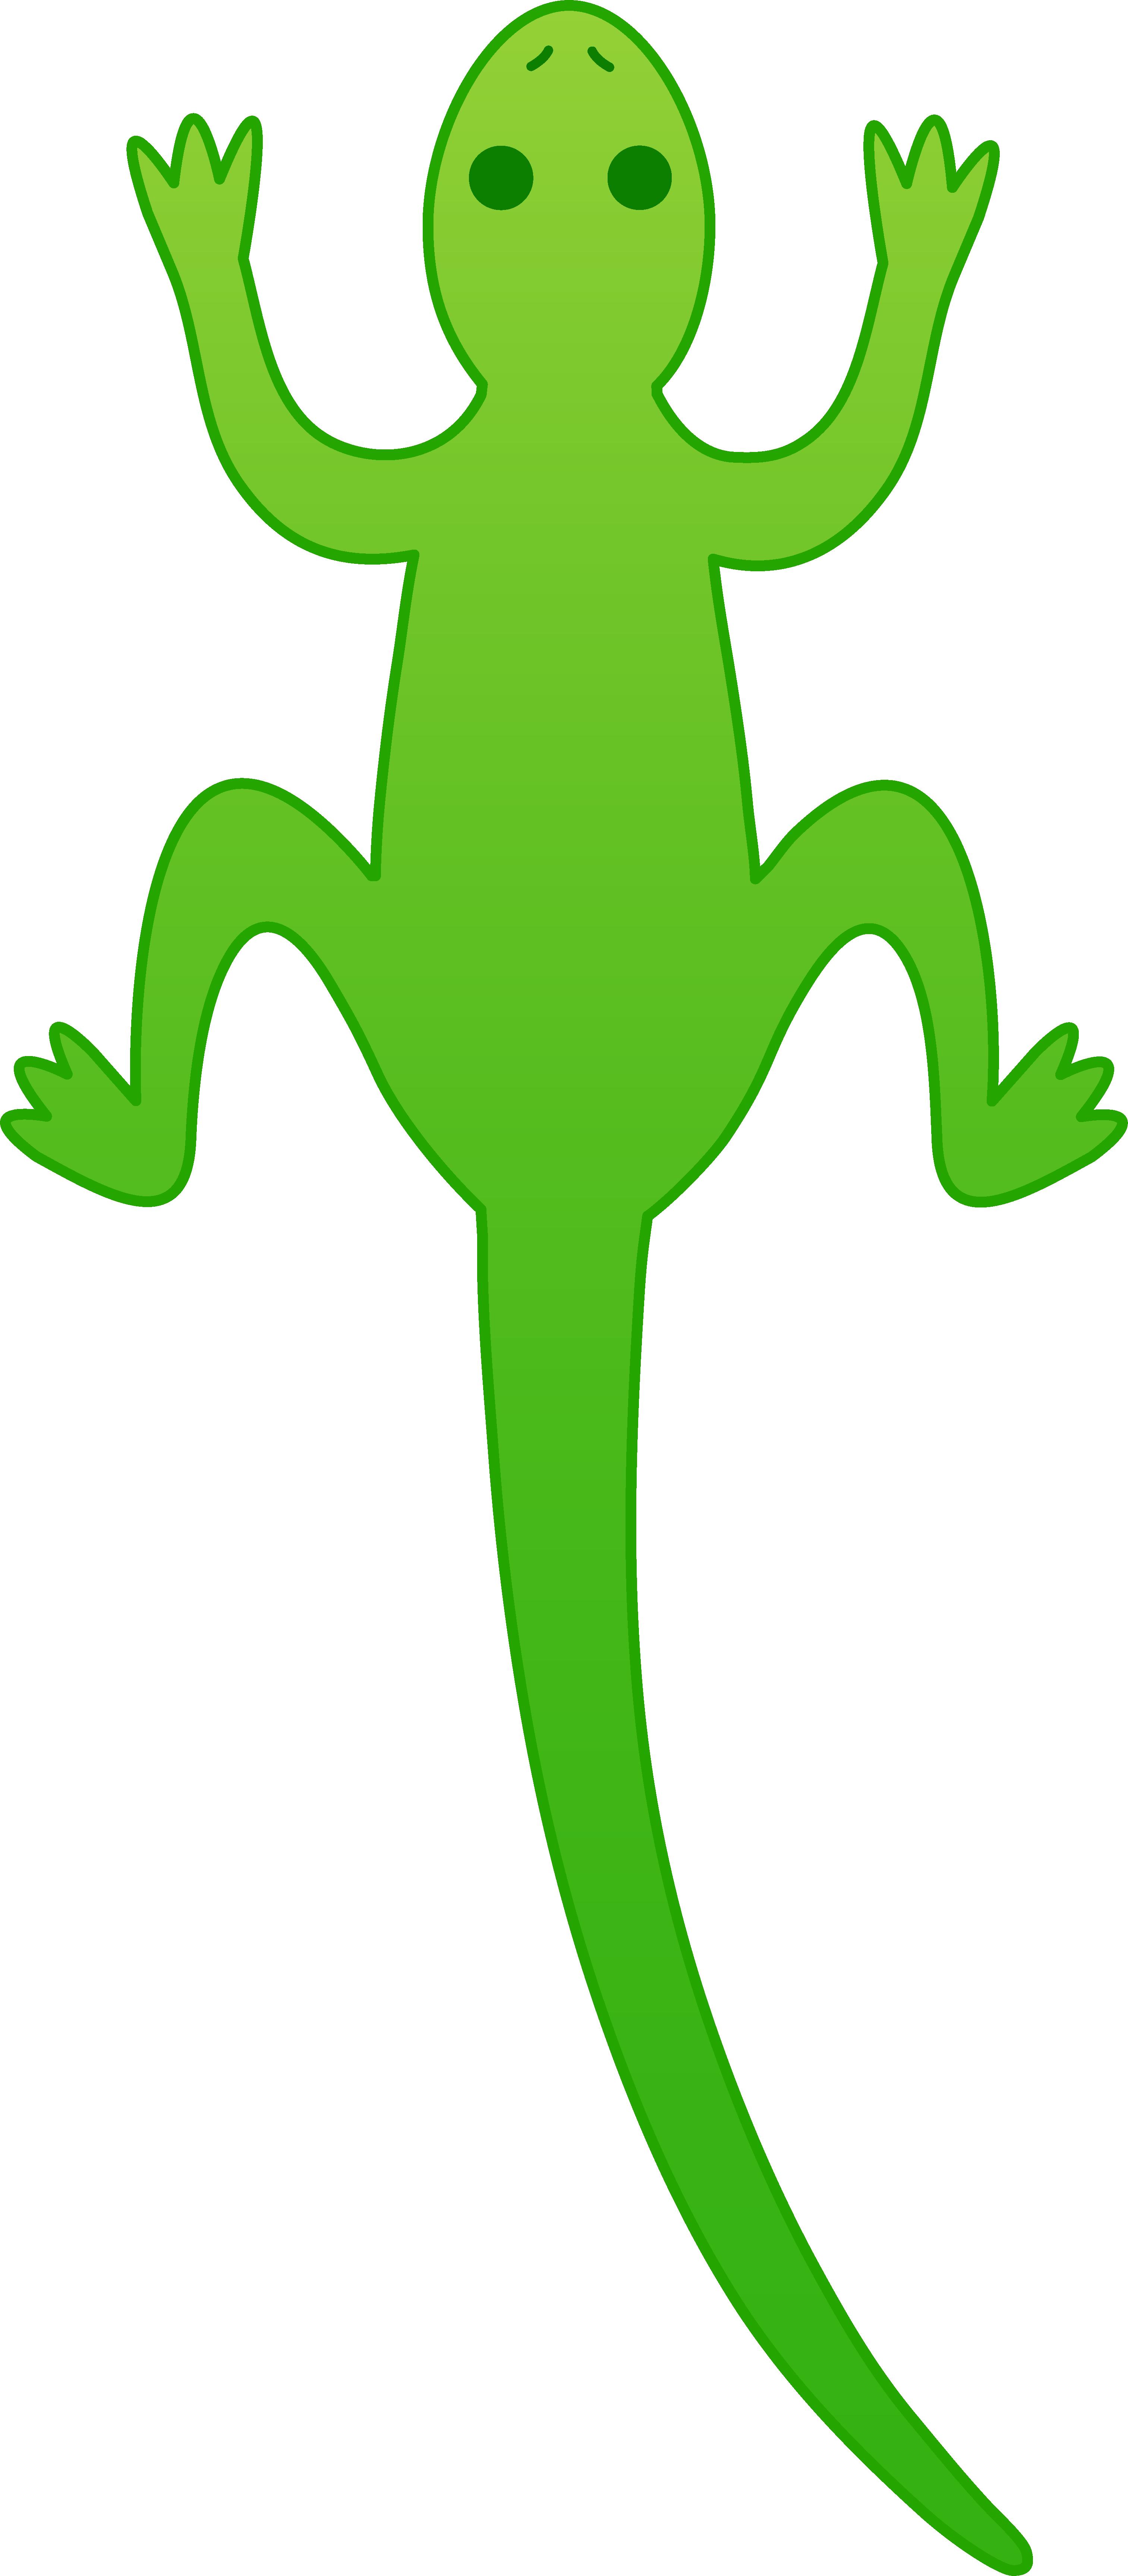 Free Lizard Cliparts, Download Free Clip Art, Free Clip Art.